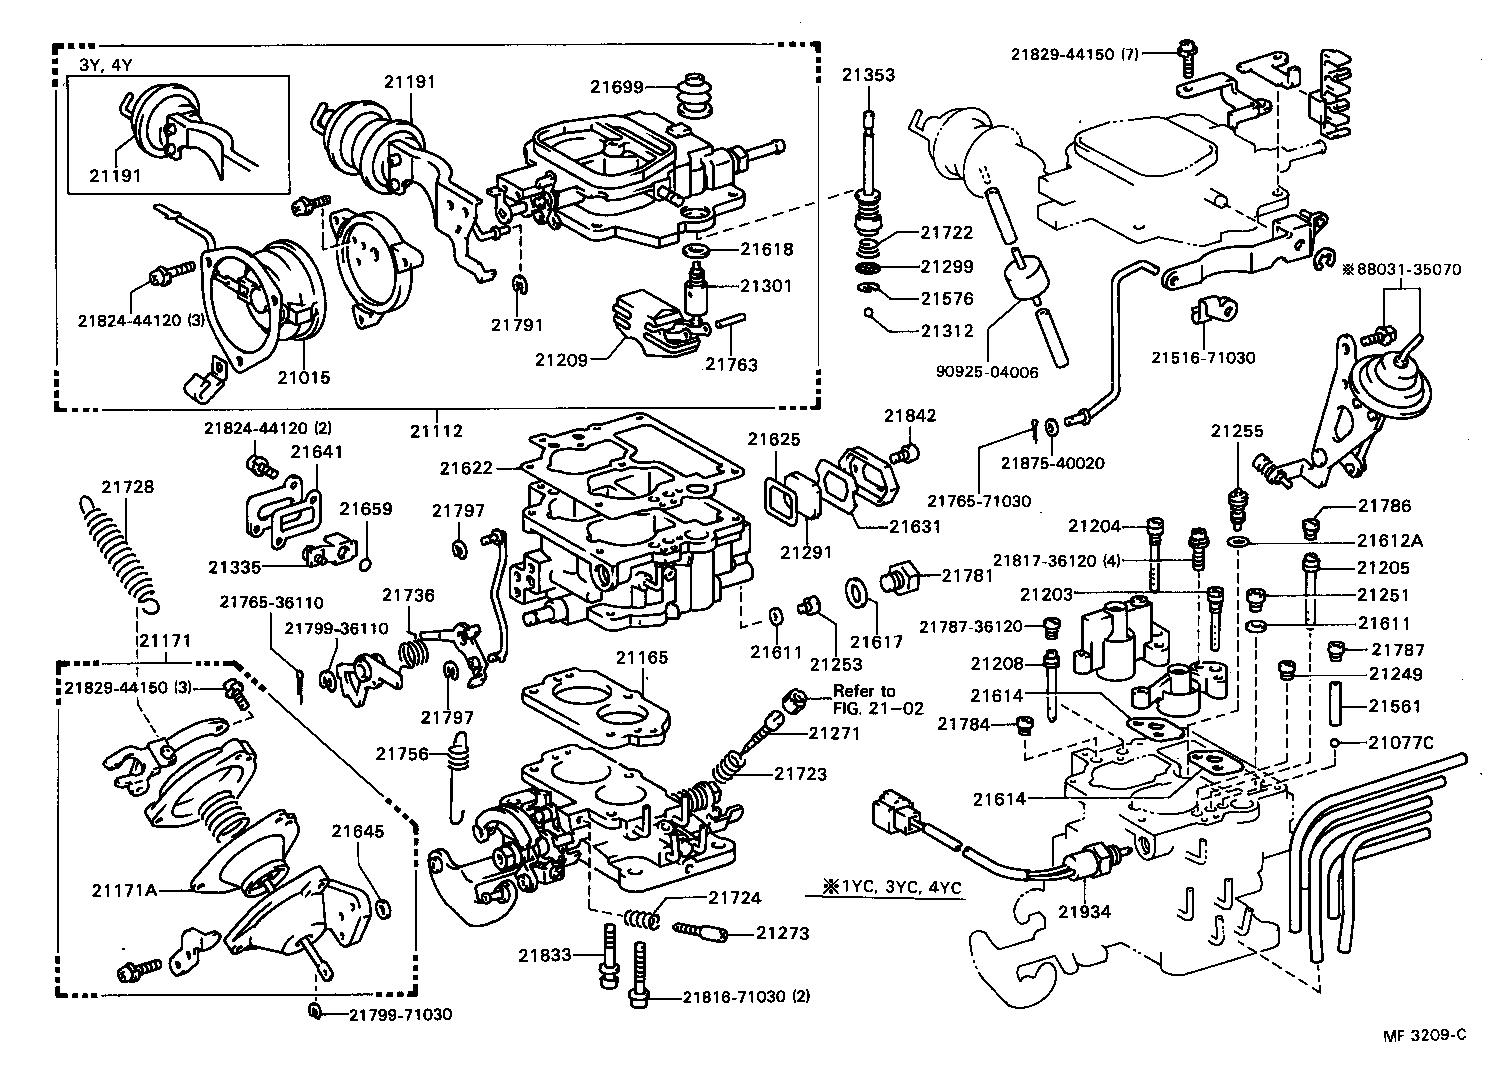 toyota avalon engine parts diagram toyota engine parts diagram ma47 #11